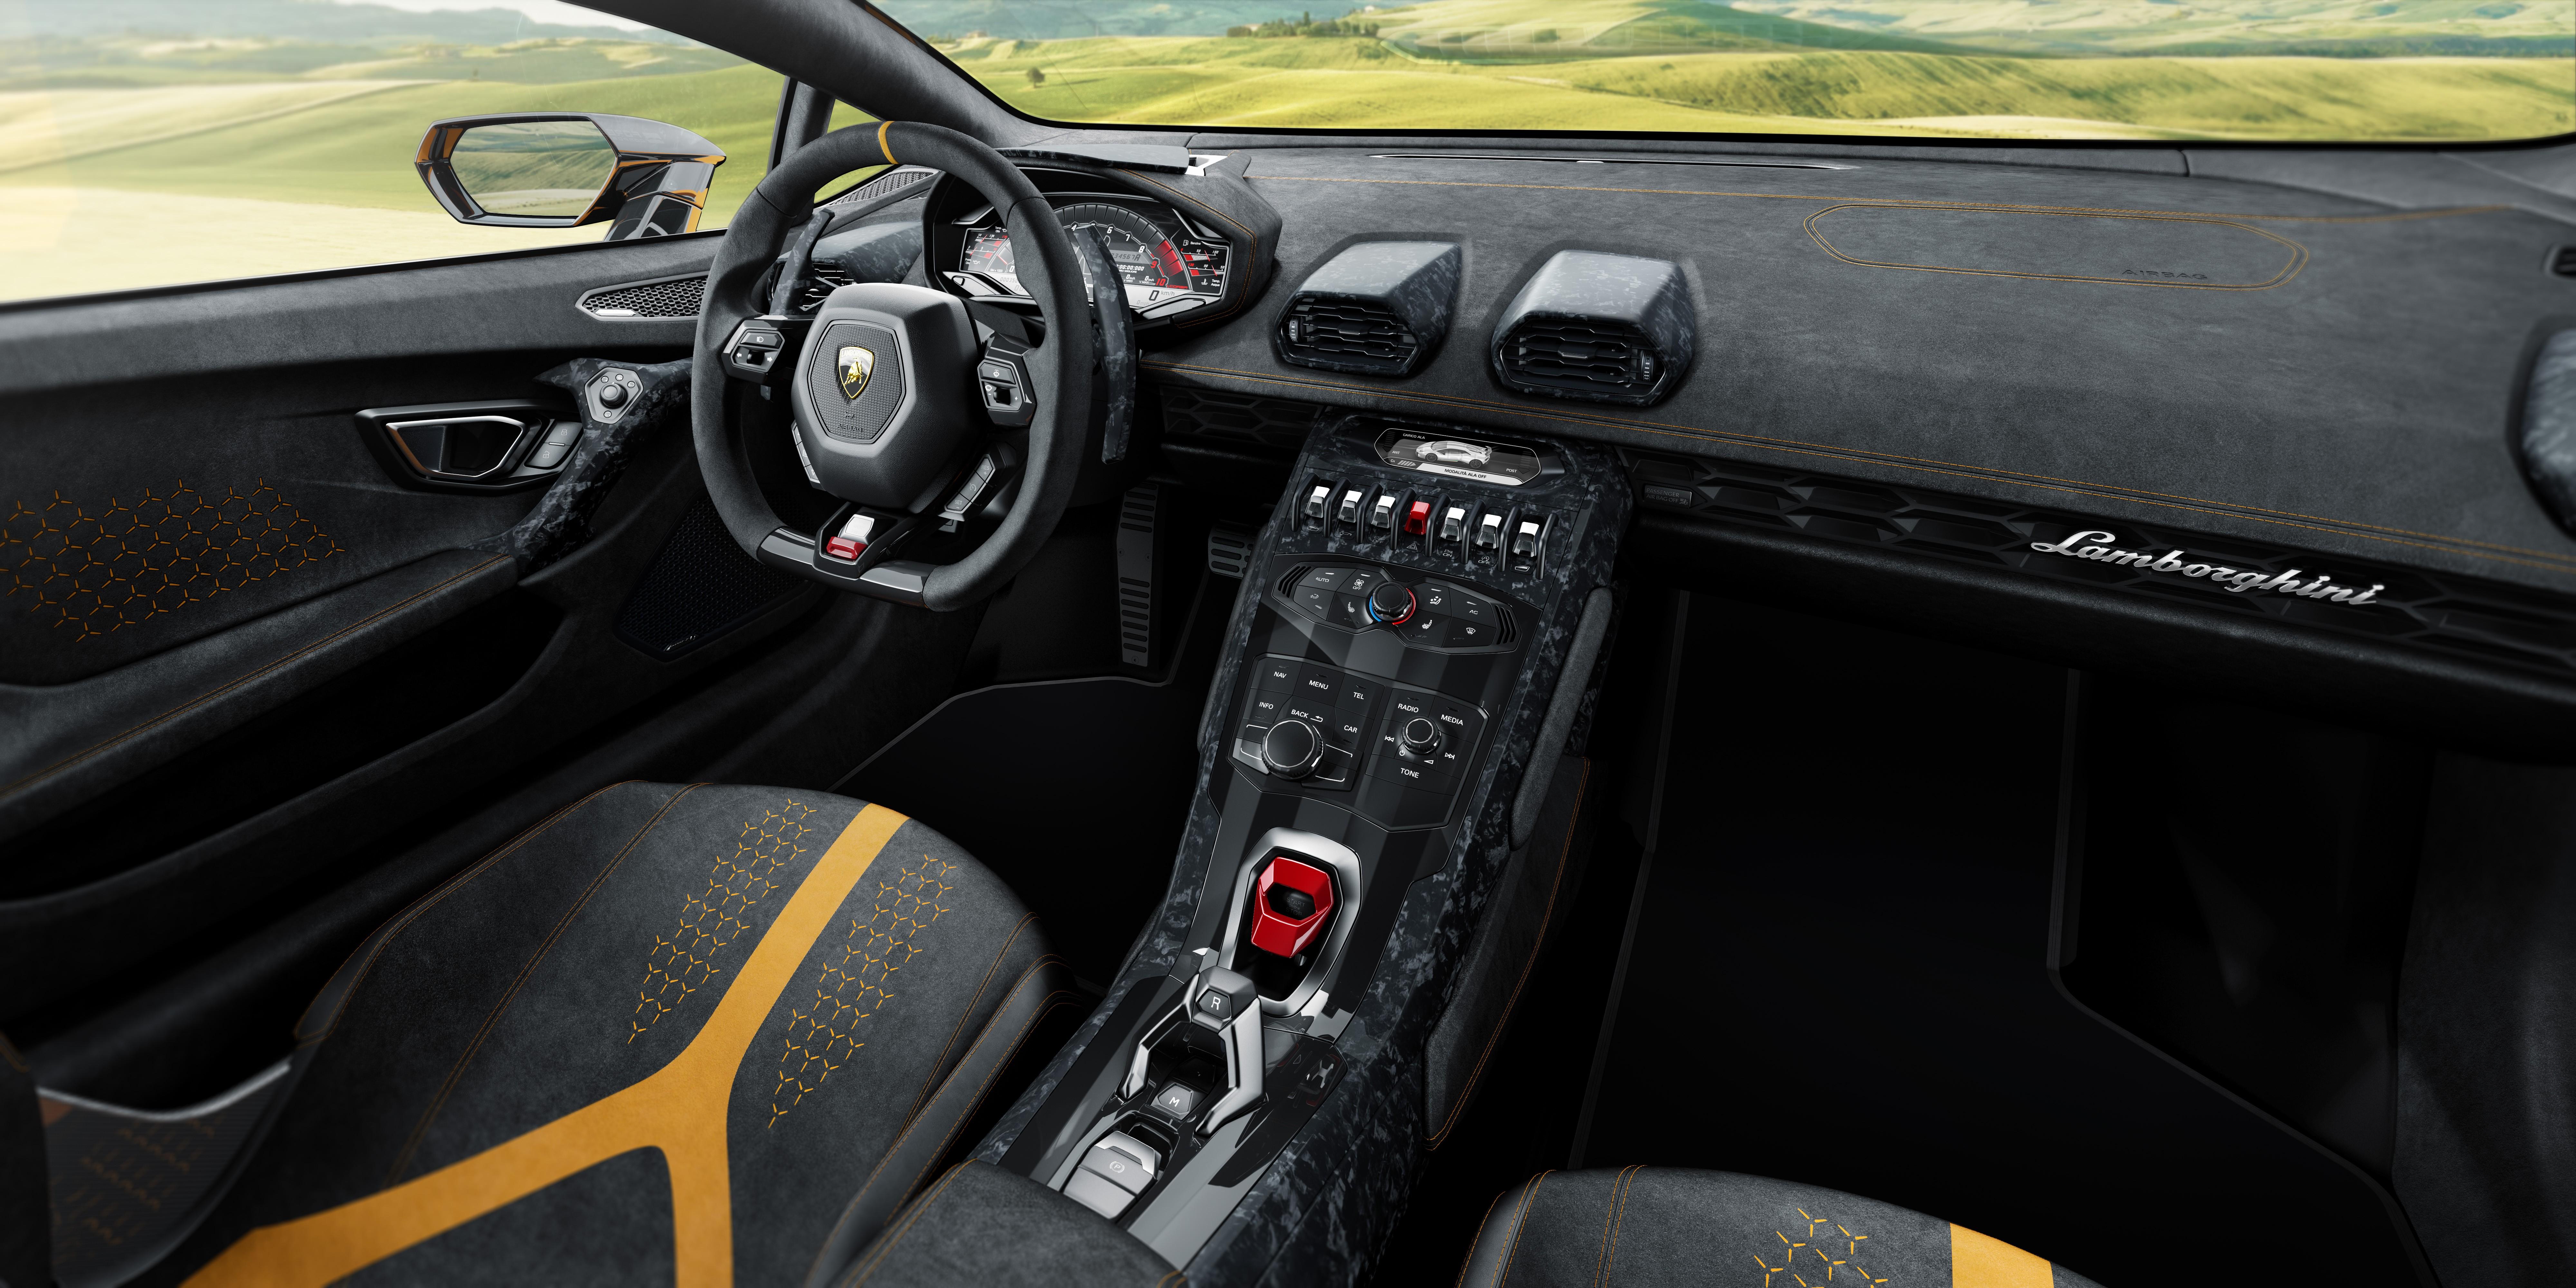 Lamborghini V10, V12 Engines Will Survive Thanks To Hybrid